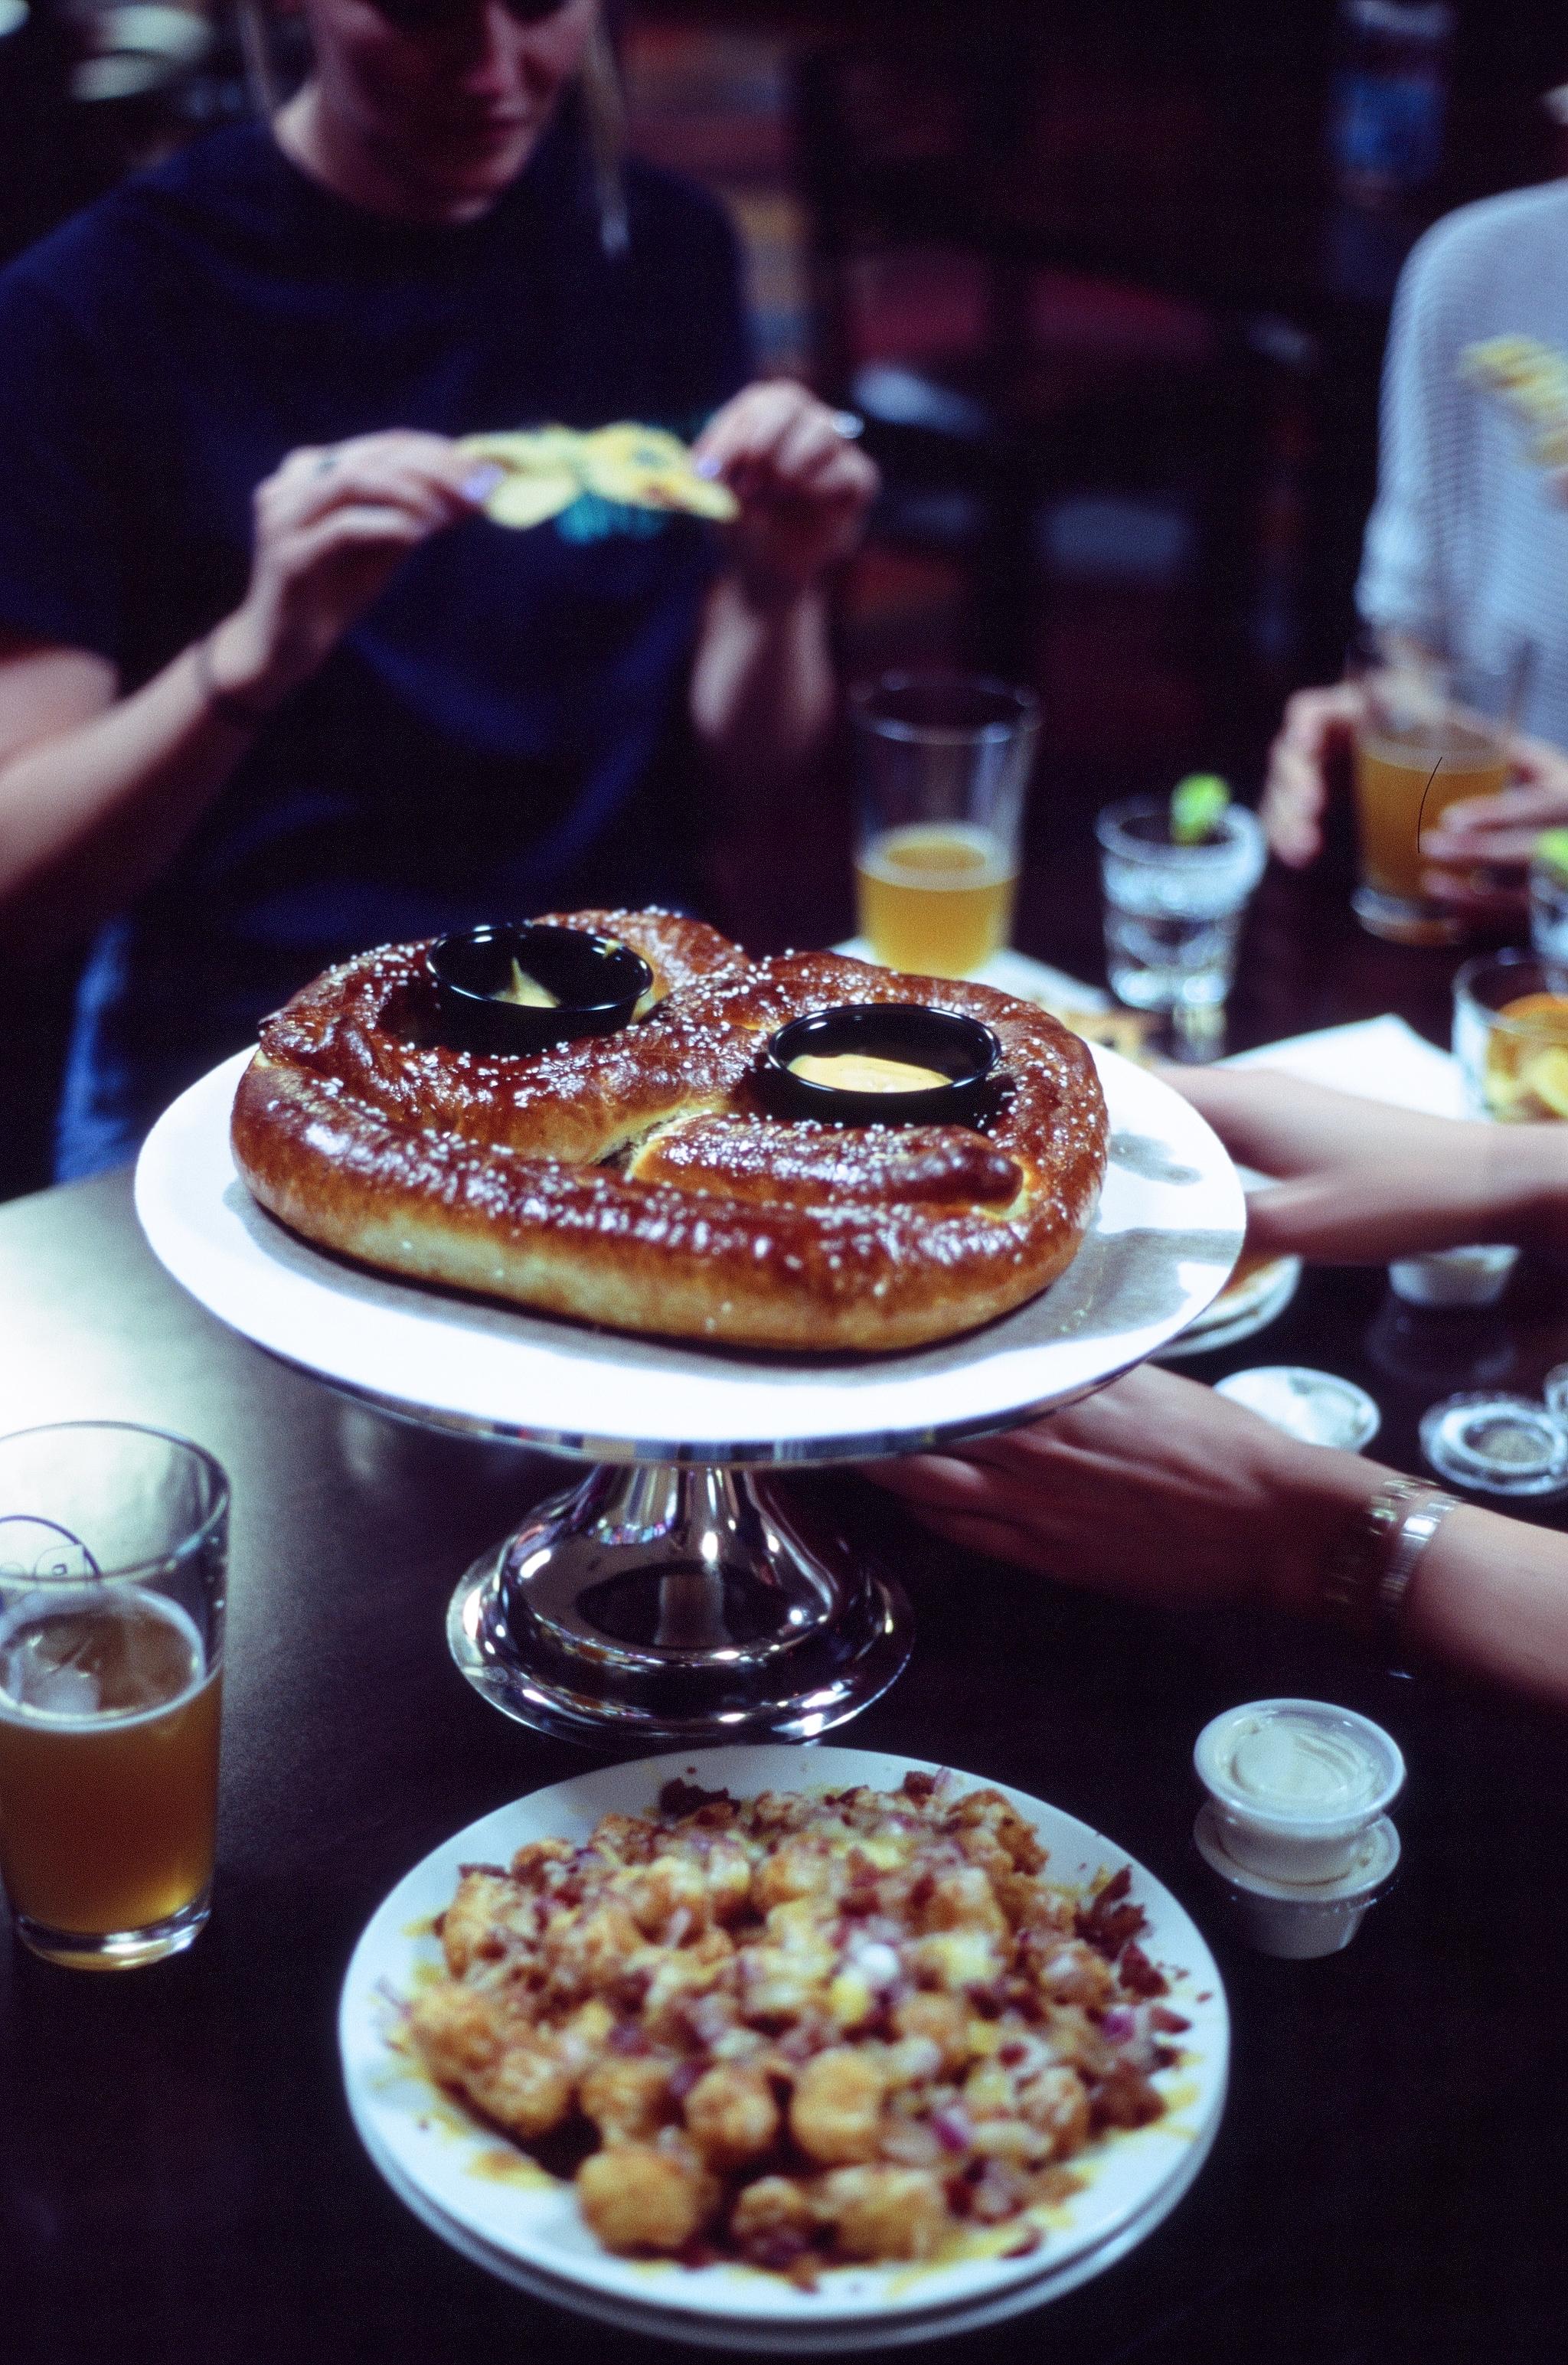 Bachelorette Party provisions